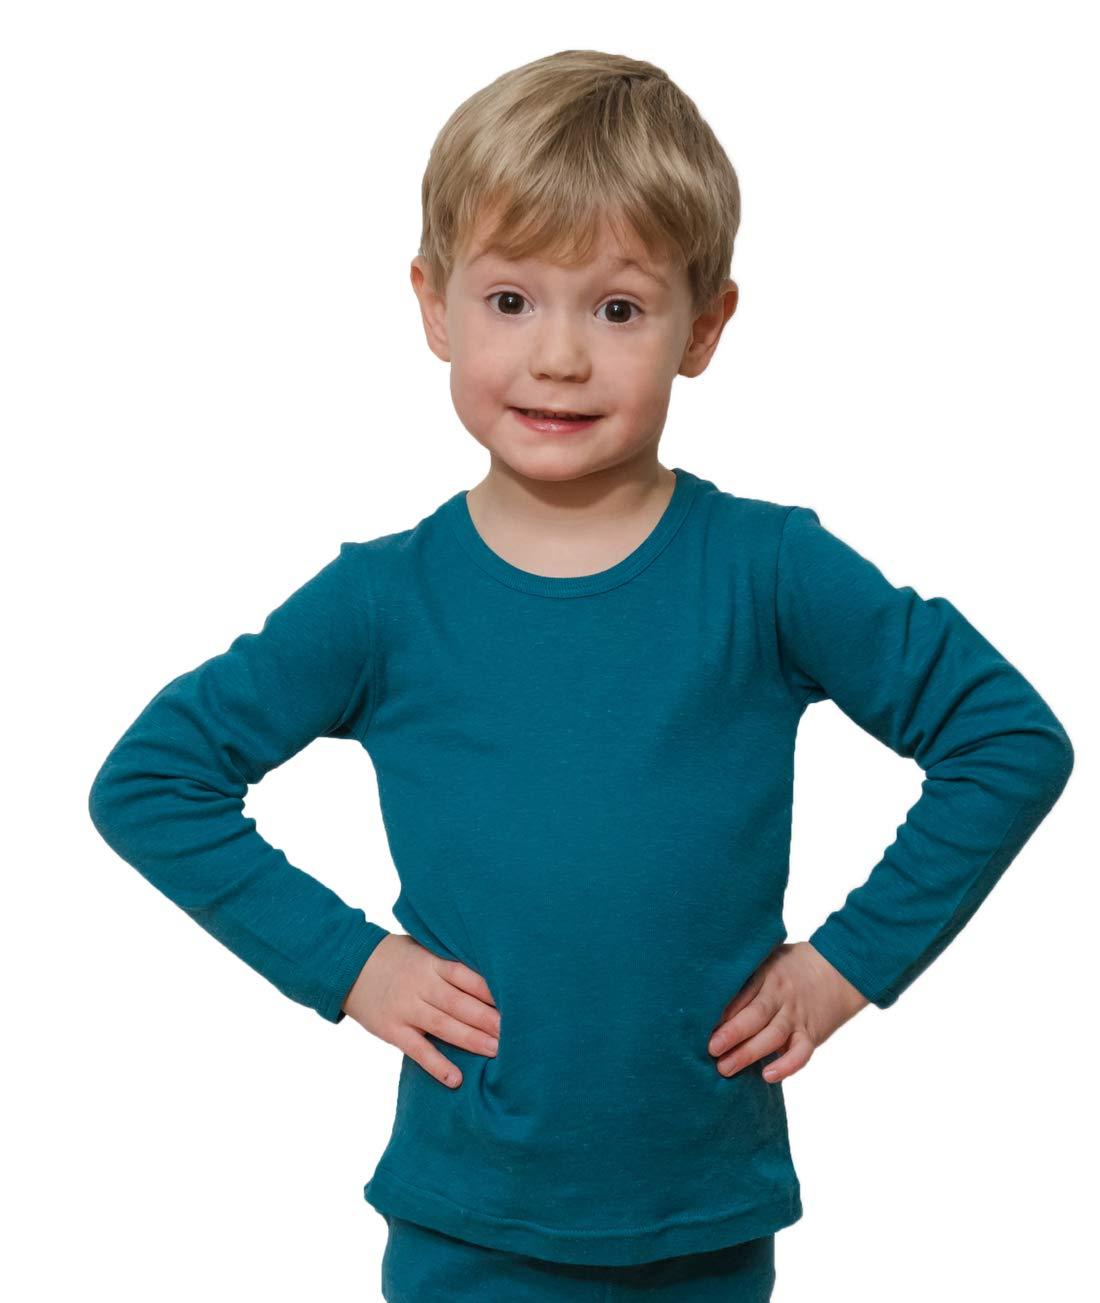 HOCOSA Children's Long Underwear Shirt, Long Sleeves in Organic Cotton/Hemp, Seagreen-Blue, Size 104 (4 yr, 40 in Tall)